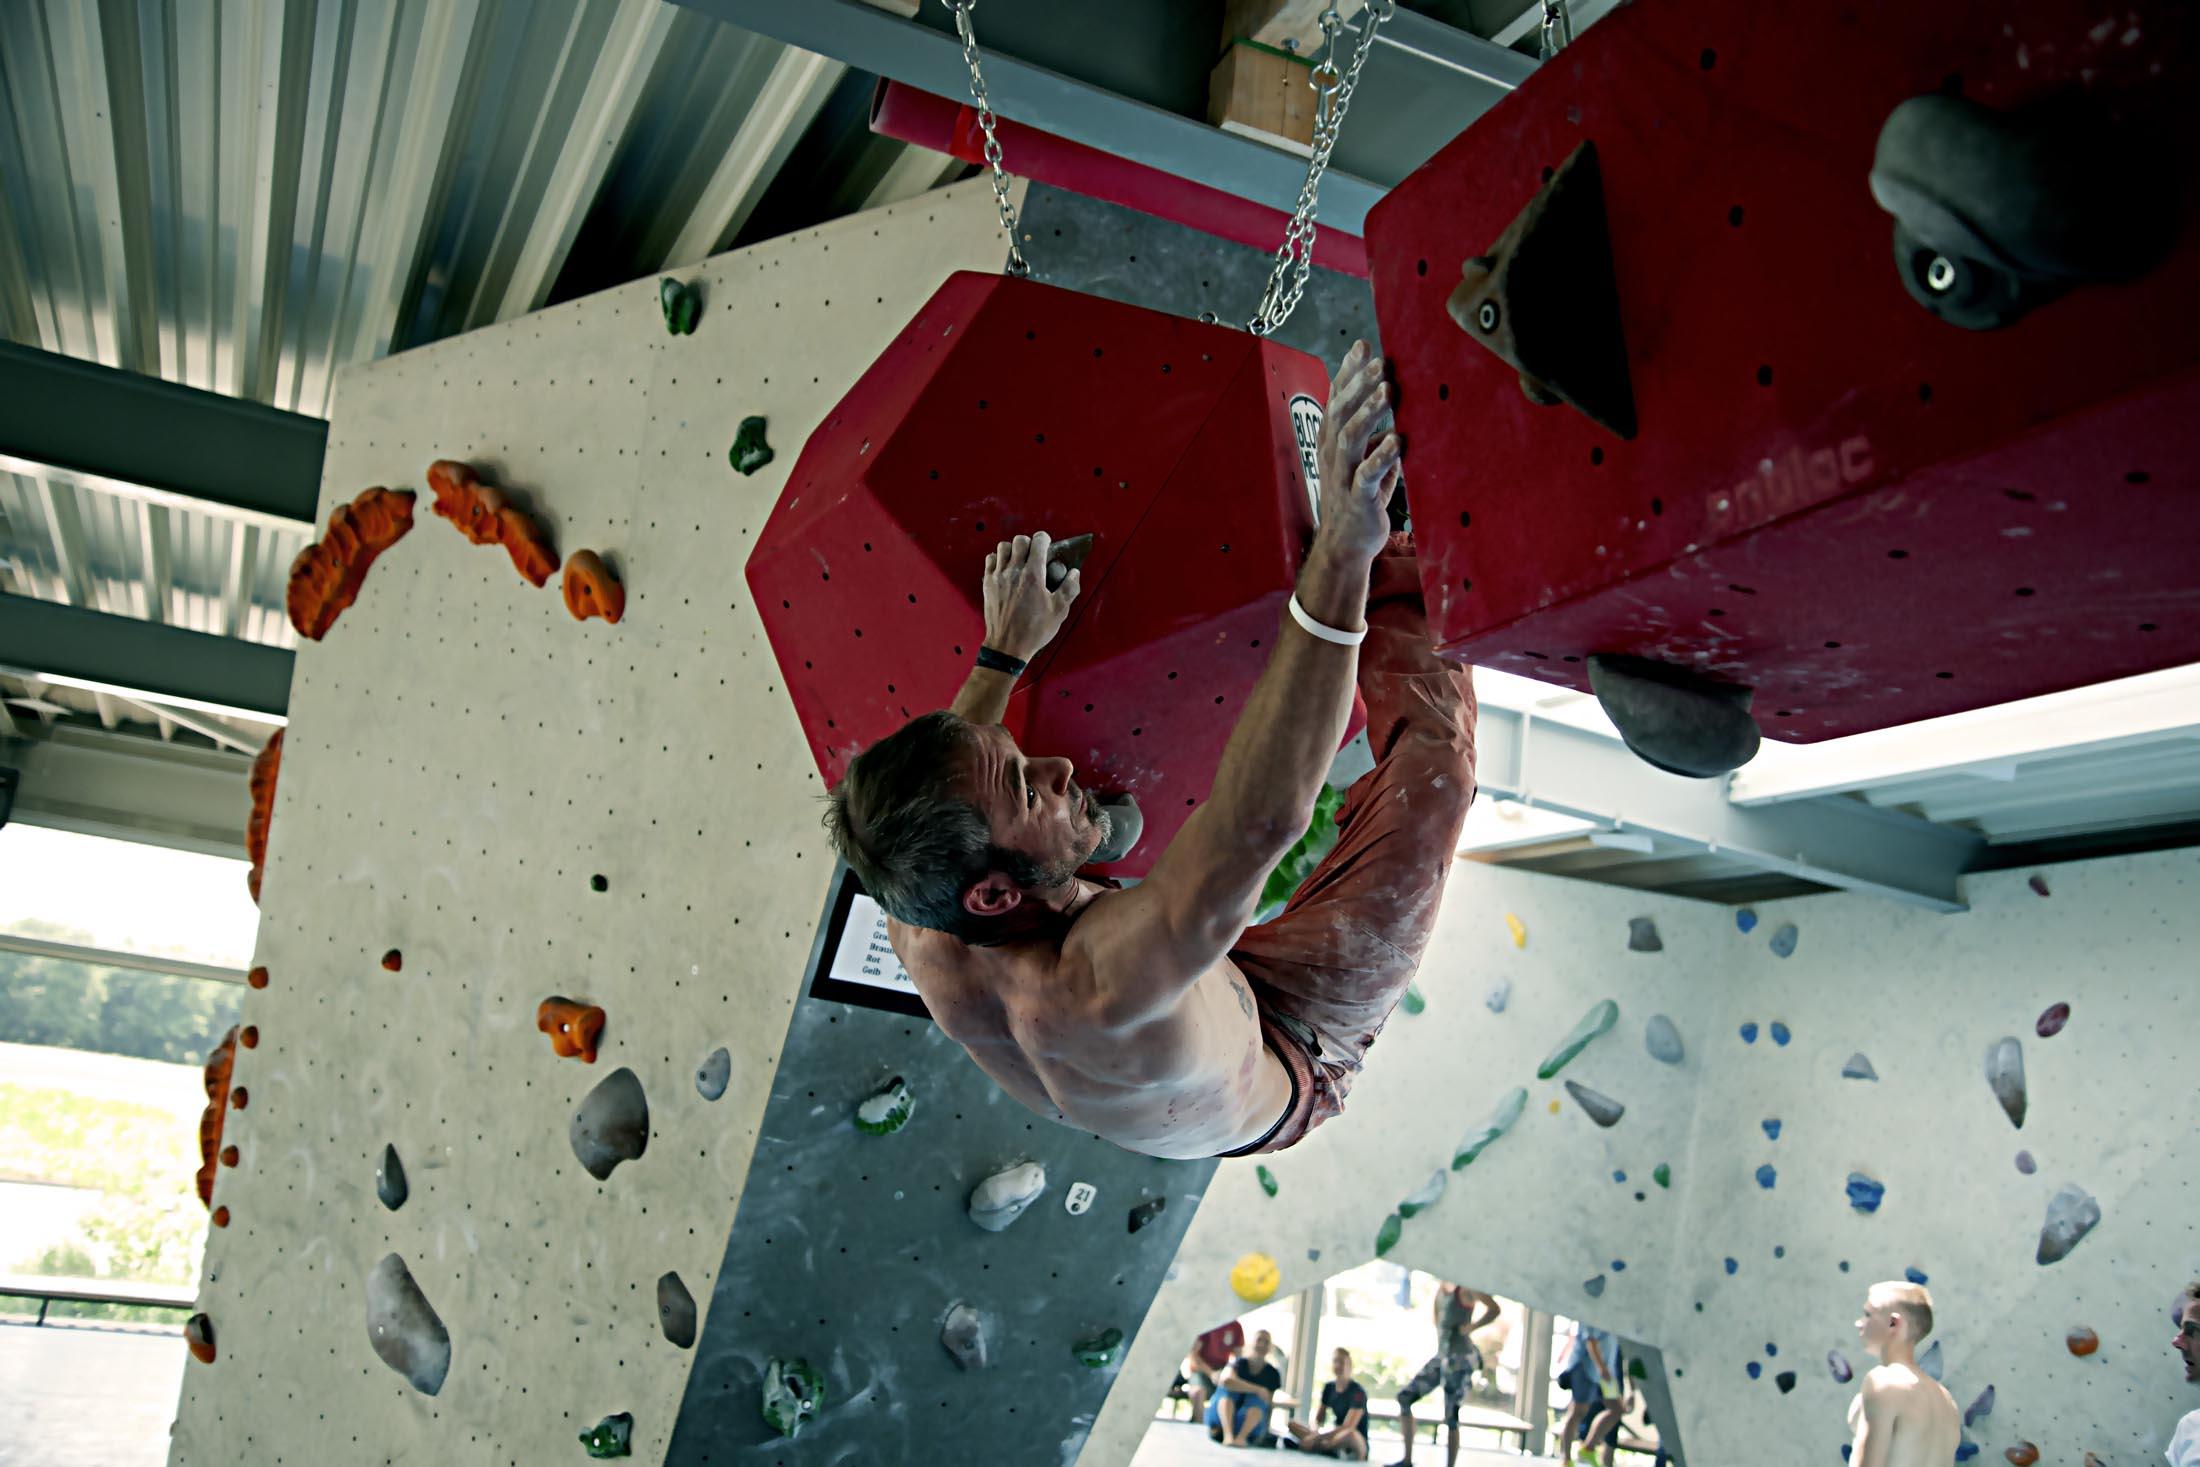 Quali, internationaler bouldercup Frankenjura 2016, BLOCKHELDEN Erlangen, Mammut, Bergfreunde.de, Boulderwettkampf07092016227